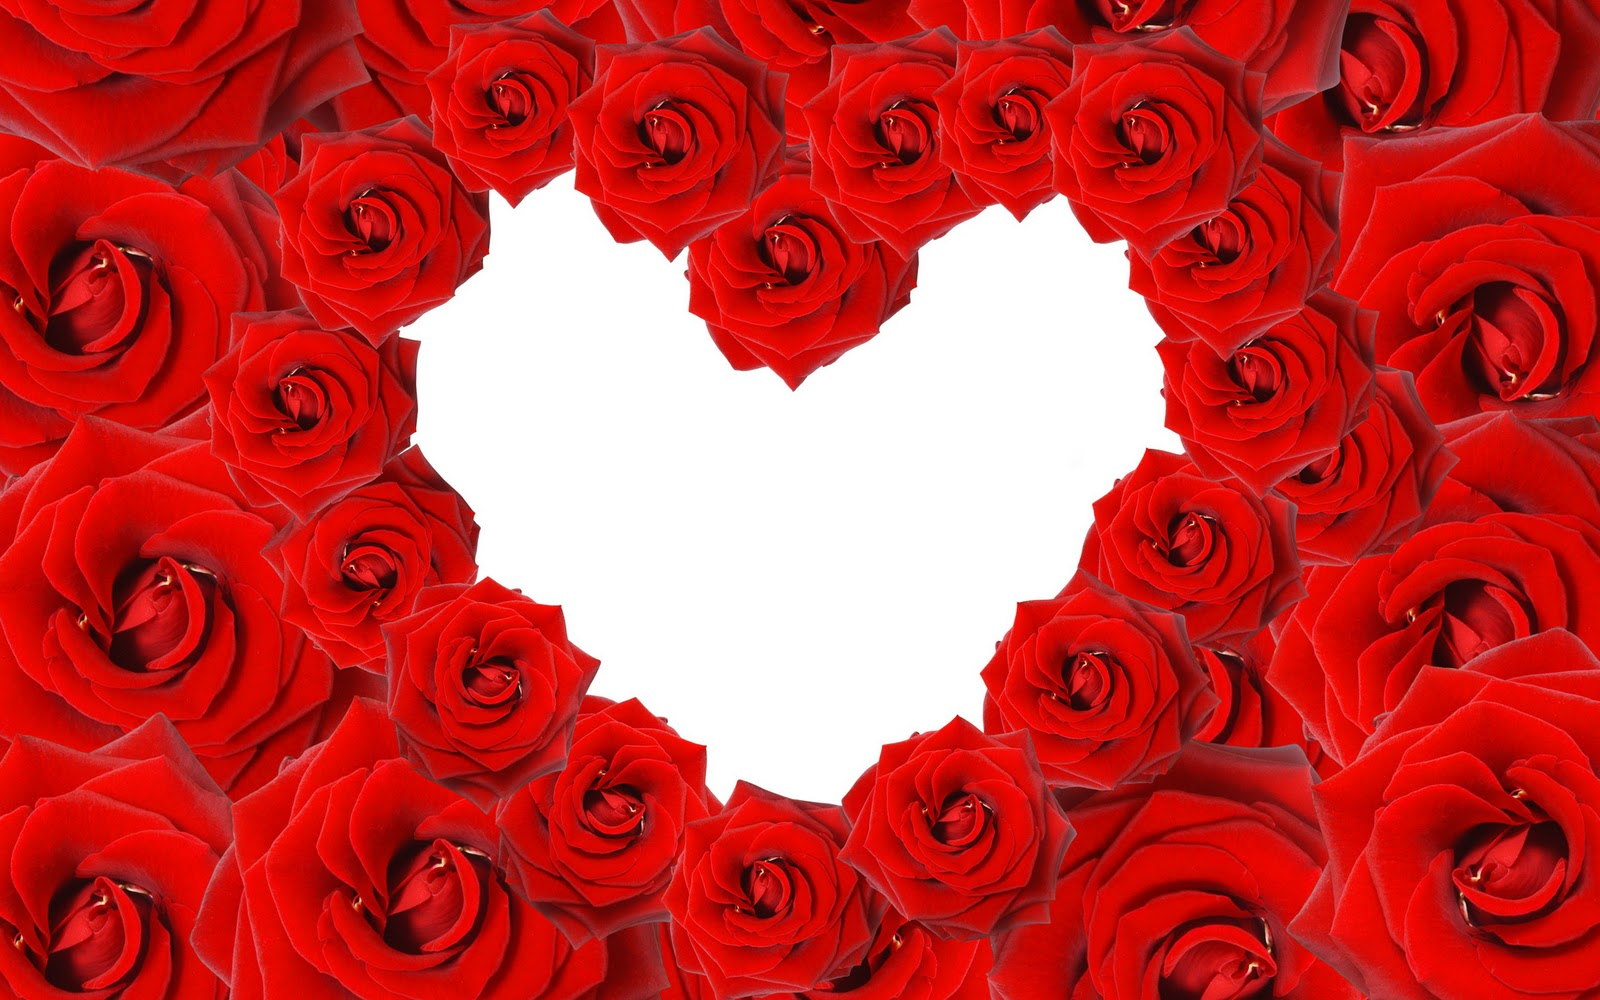 http://4.bp.blogspot.com/-Cf61RXo4BKg/TyrI9eVYfwI/AAAAAAAABH0/Rwmn7AG4bhg/s1600/Love+On+Red+Rose.jpg